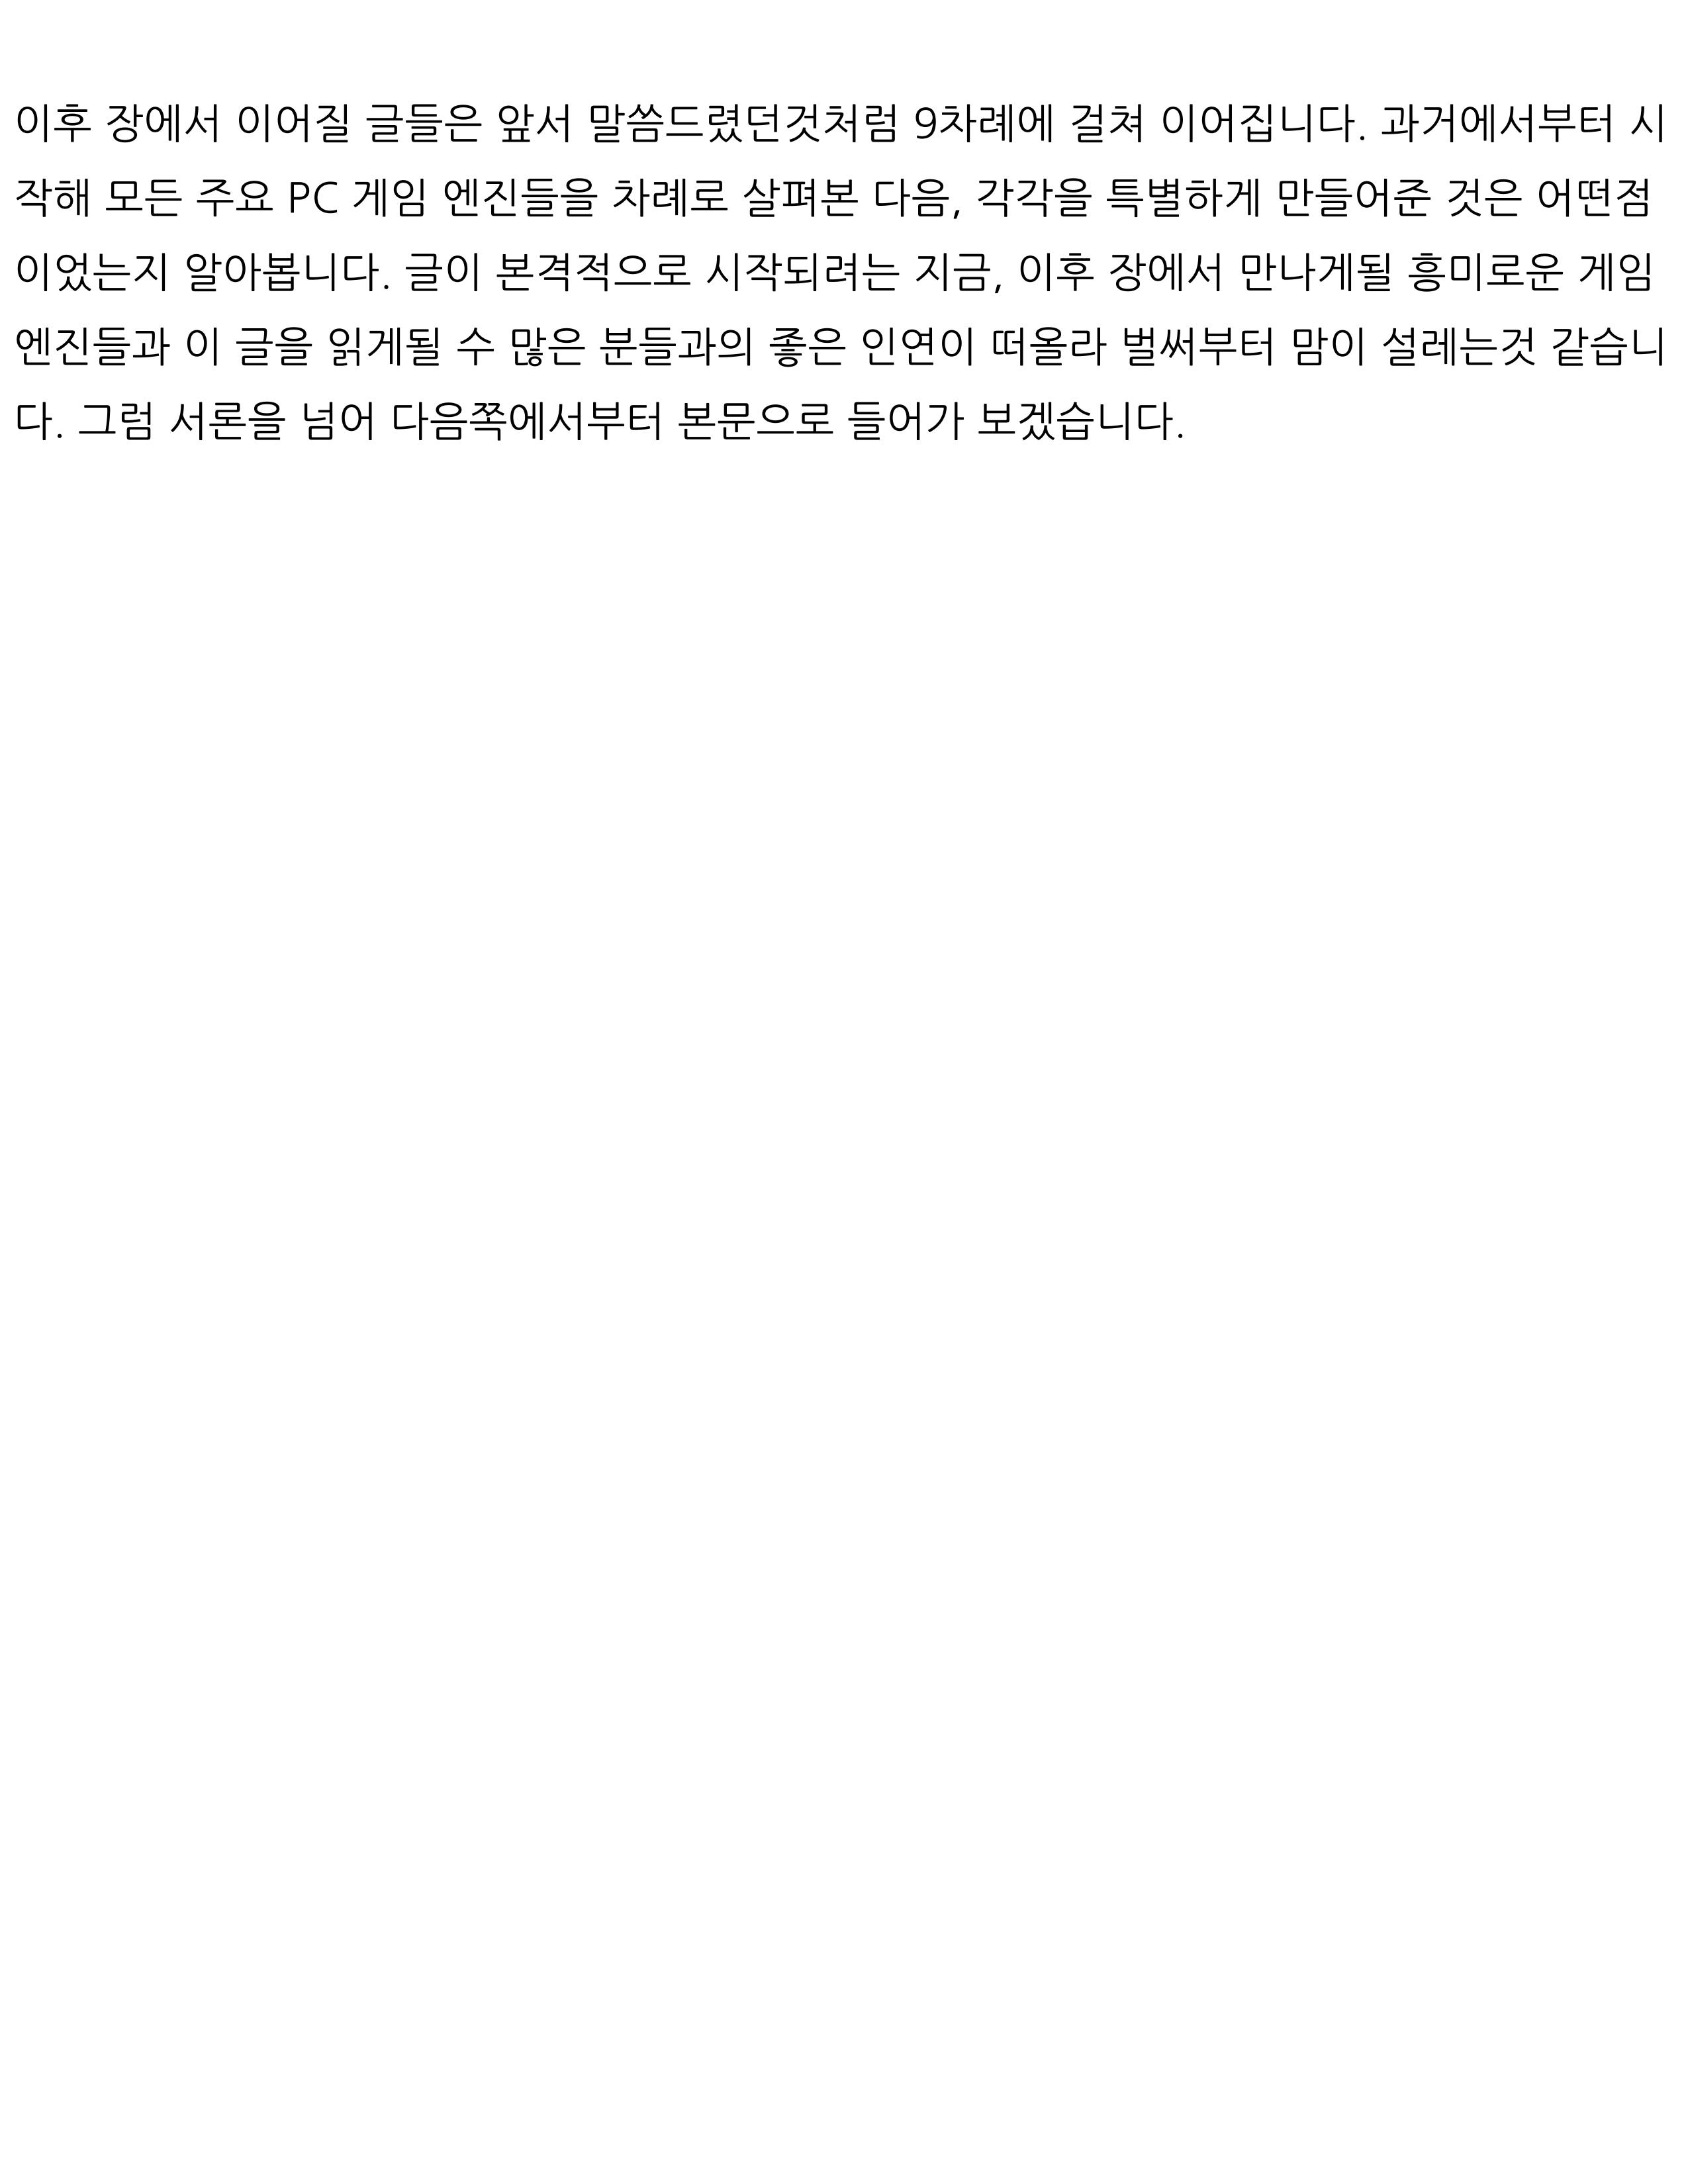 3D geim enjin, eoddeohge baljeo - jeonhyeonseog_08